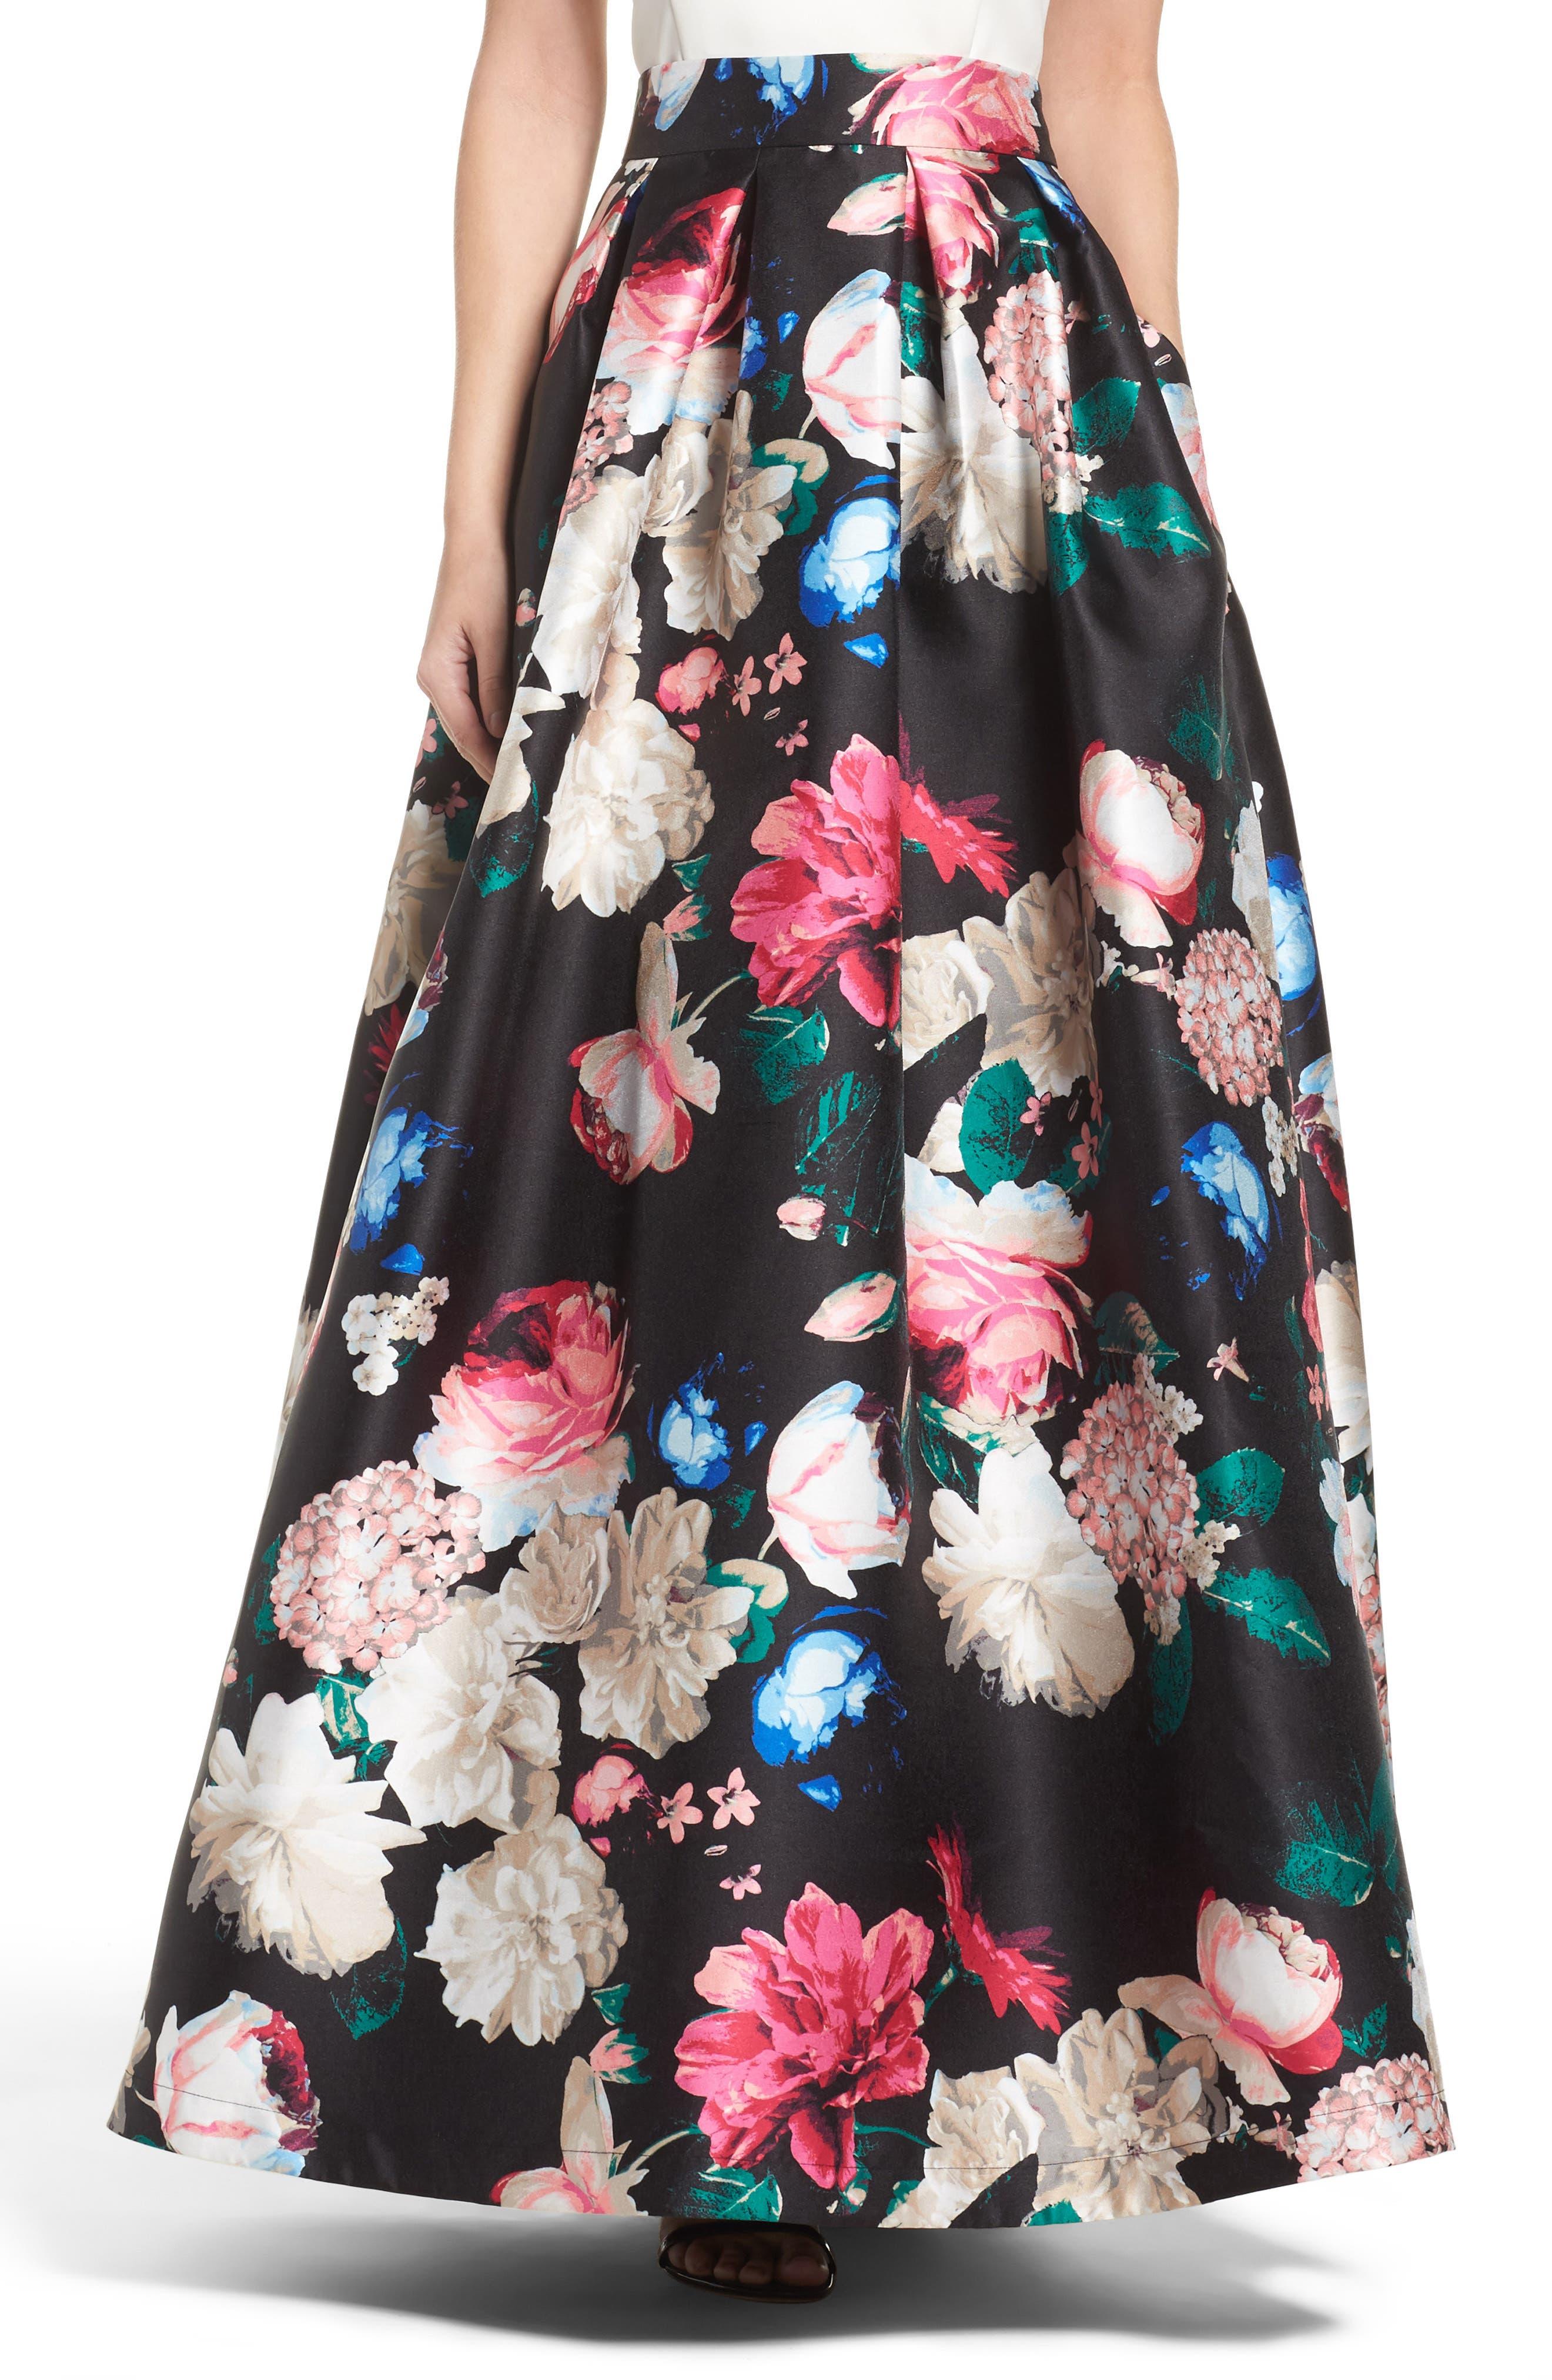 Faille Ball Skirt,                         Main,                         color, Black/ Pink